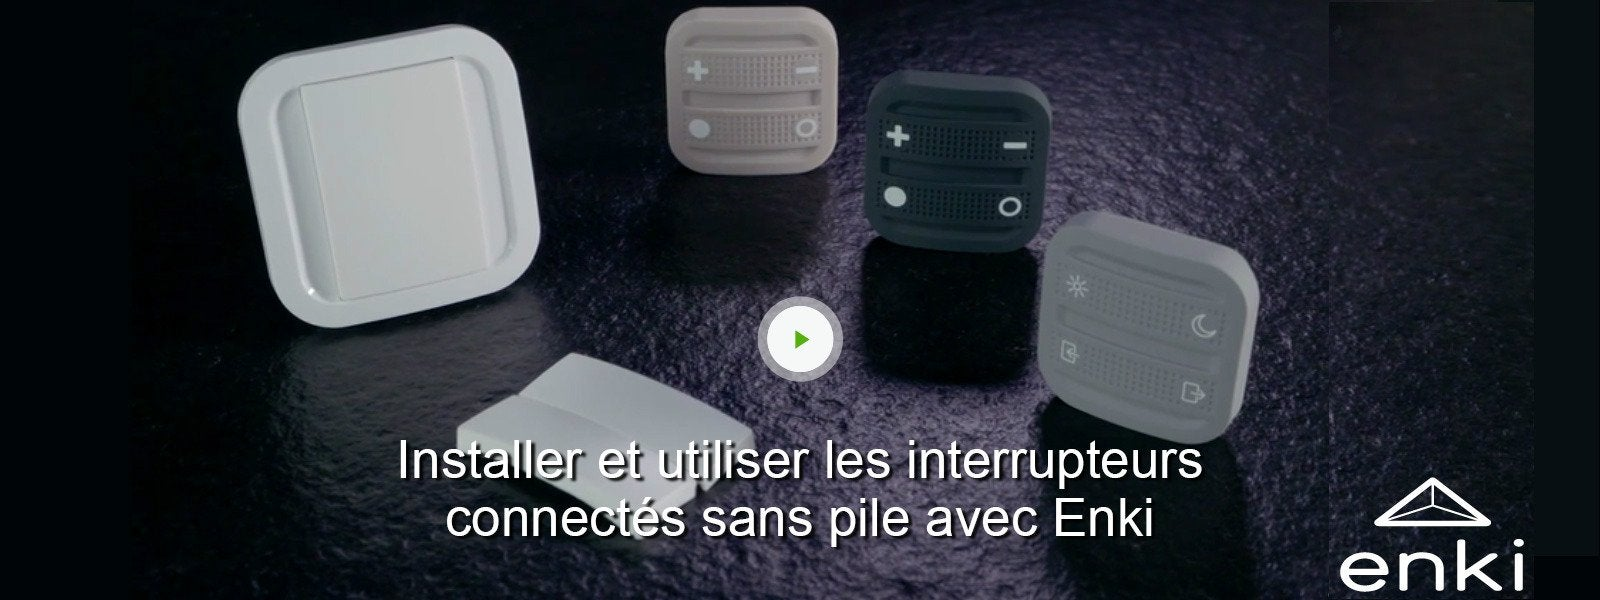 interrupteur mural connect 1 et 2 boutons sans fil sans pile nodon cws 2 1 01 leroy merlin. Black Bedroom Furniture Sets. Home Design Ideas